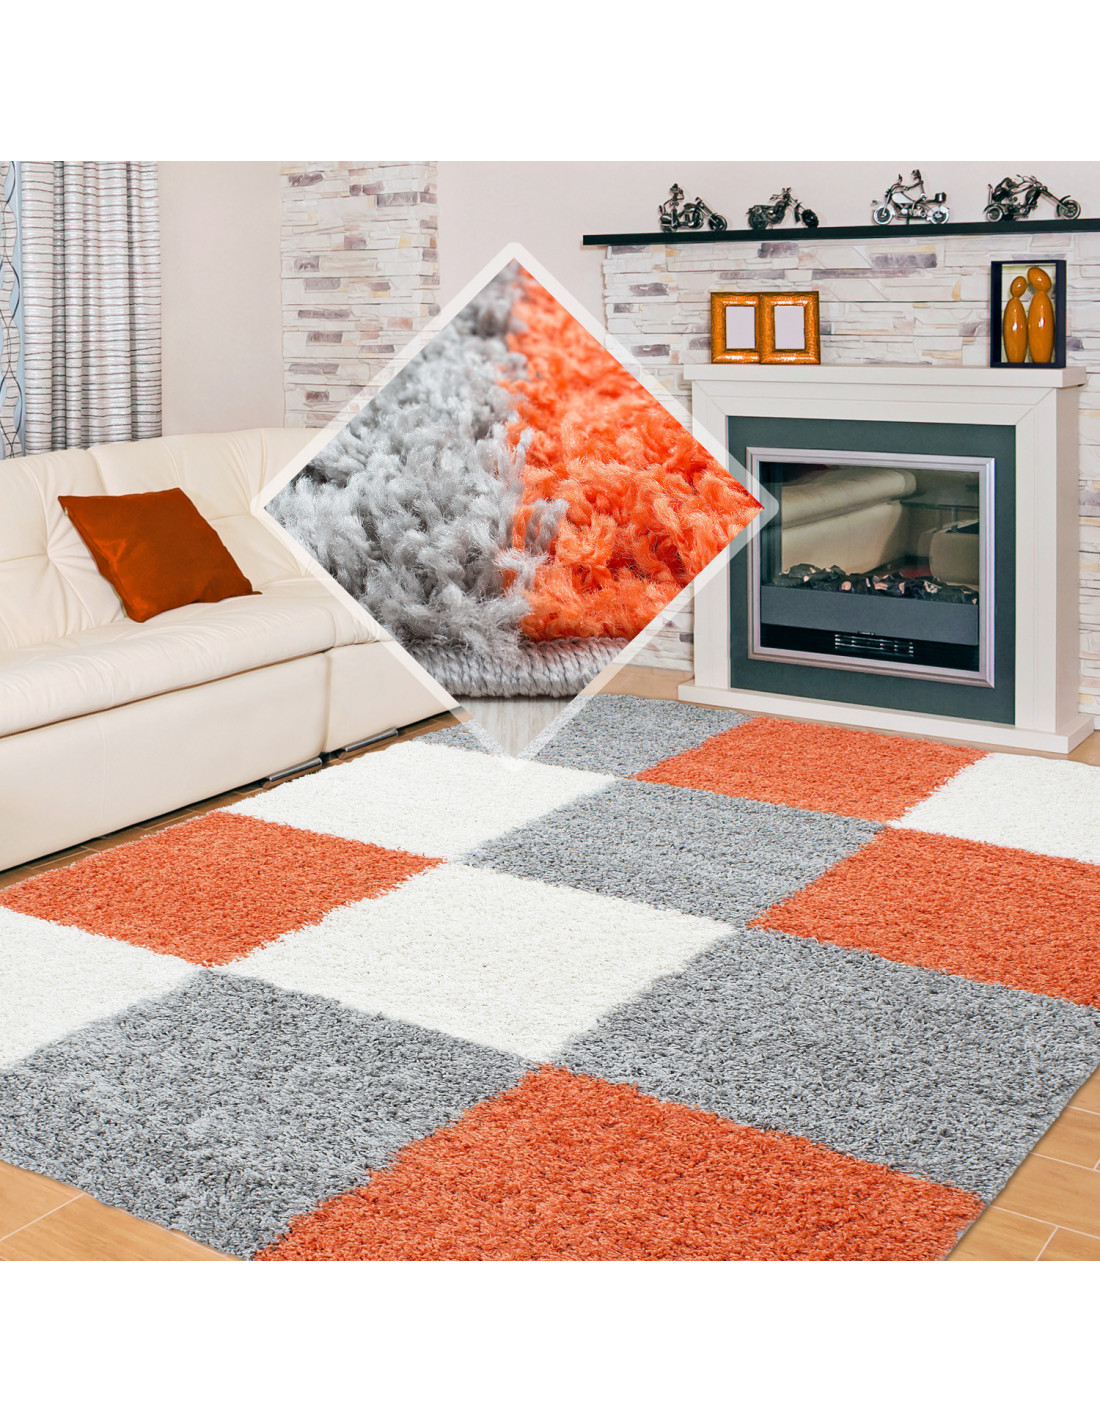 Shaggy carpet checkered terracotta white gray